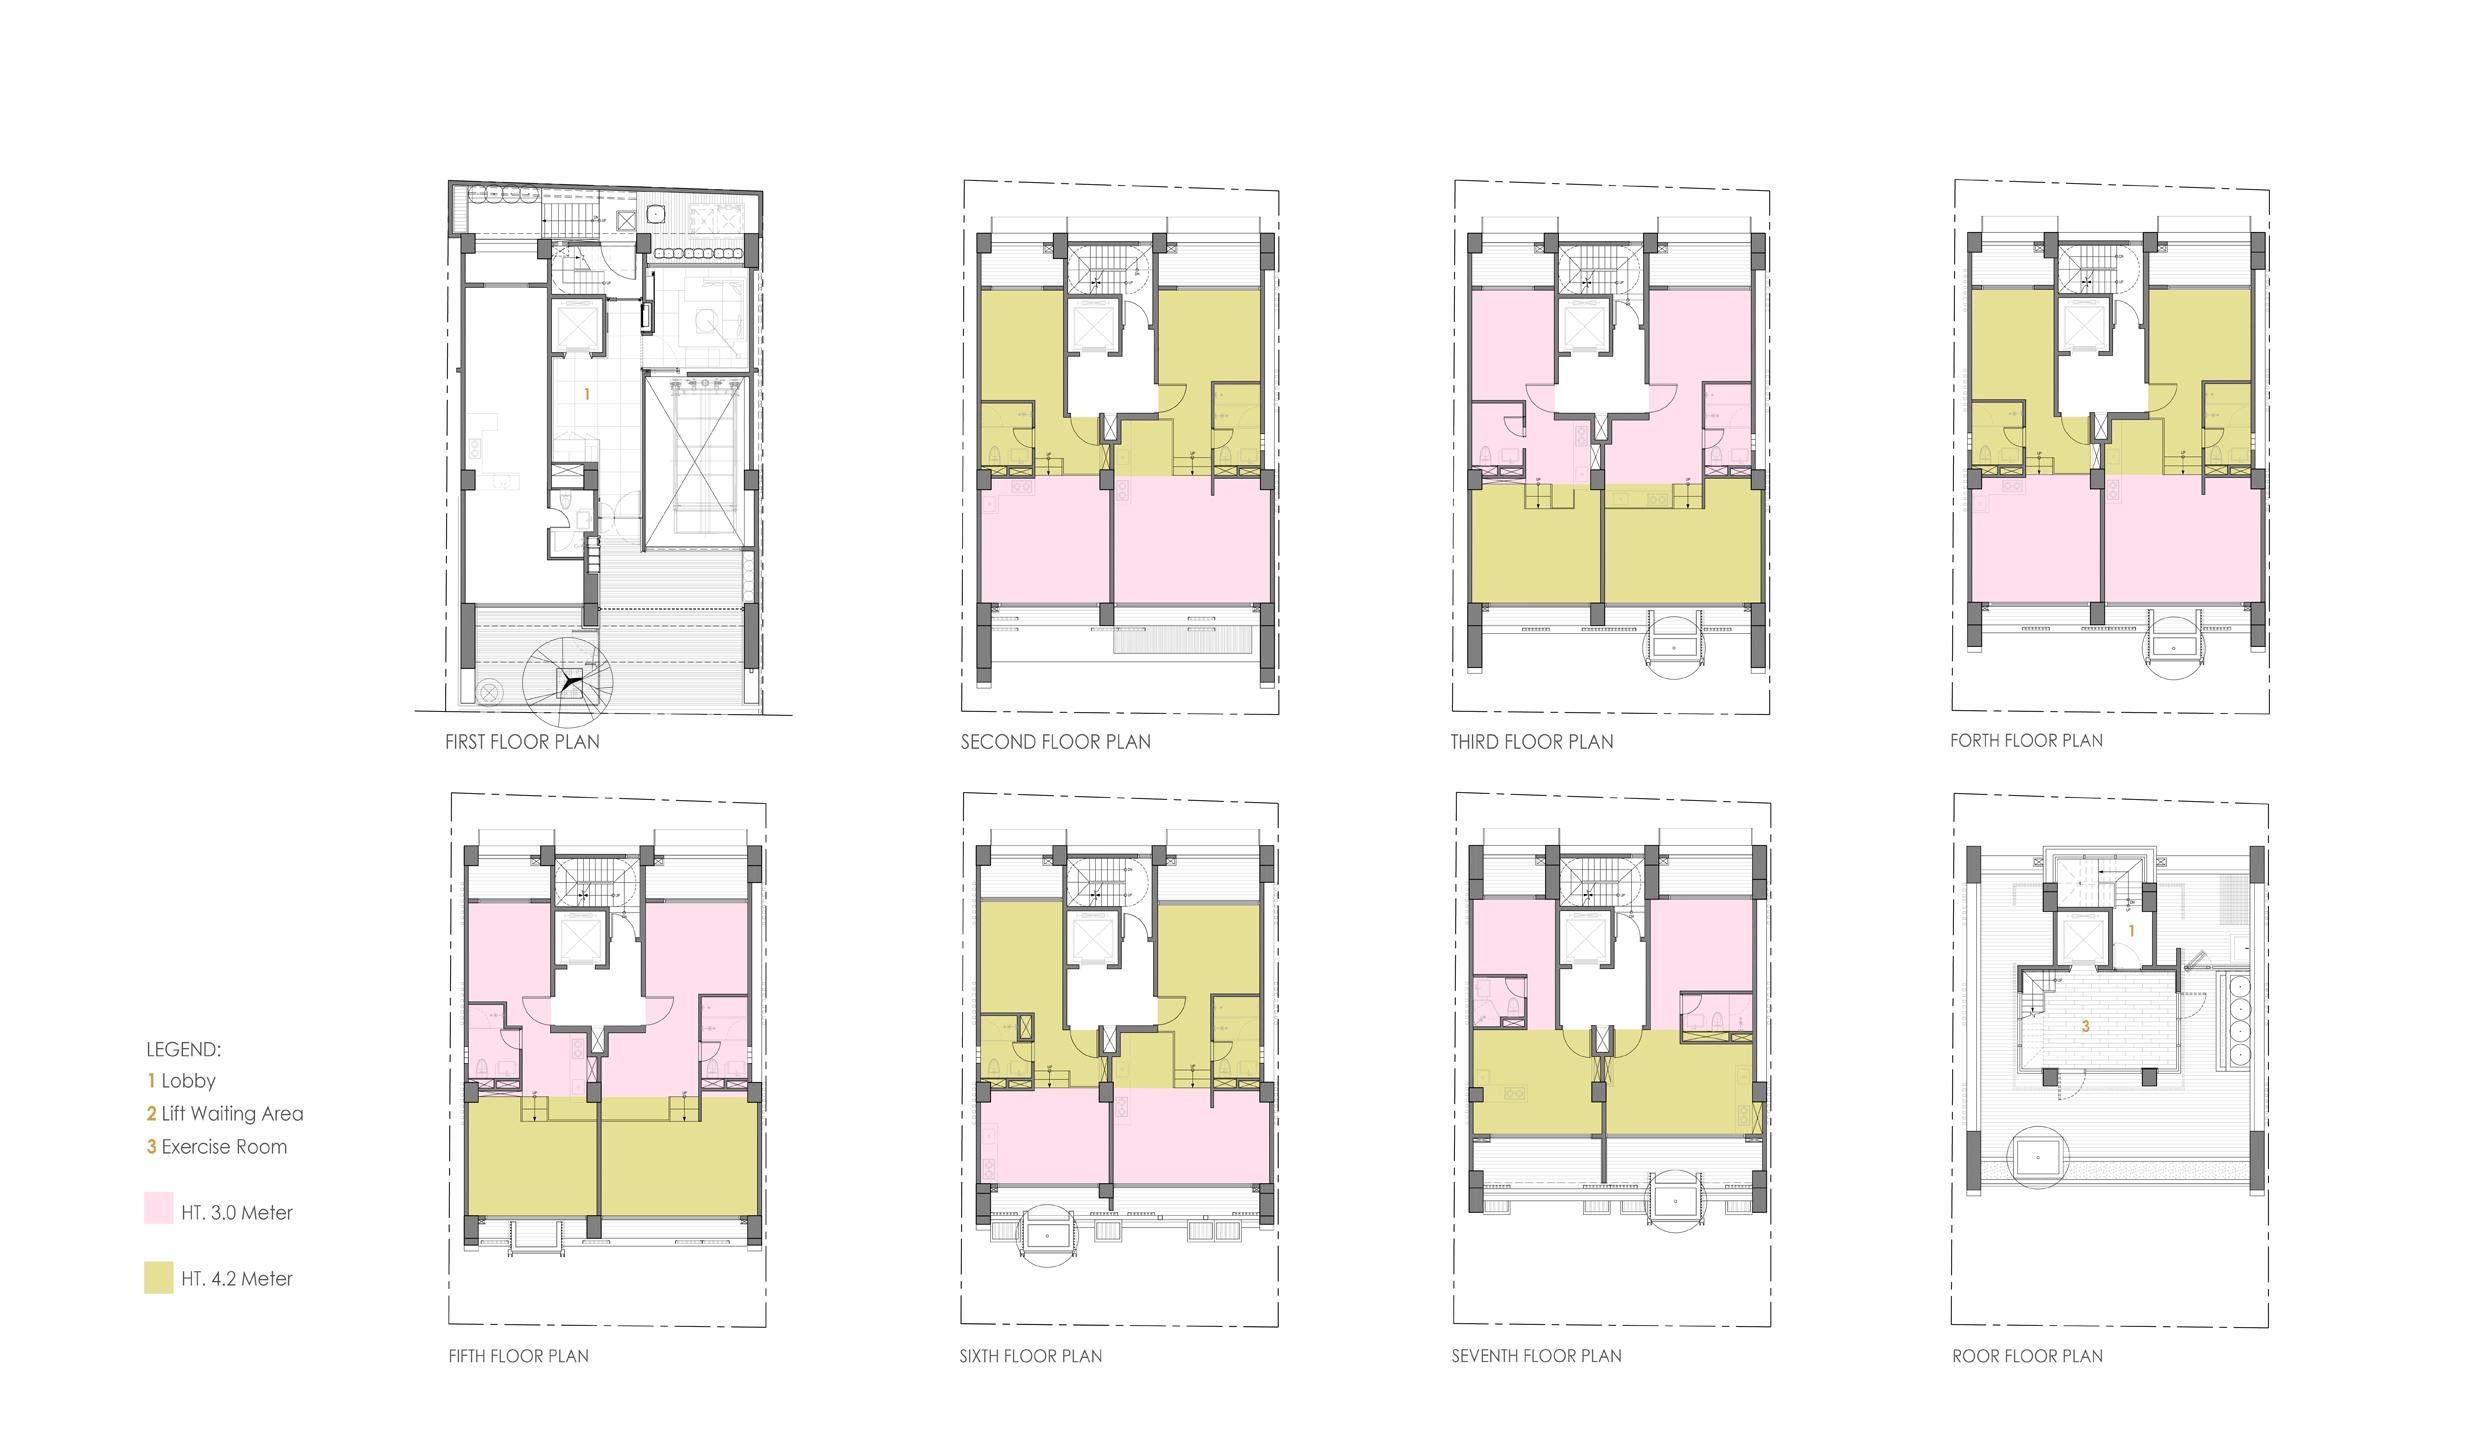 All Floor Plans }